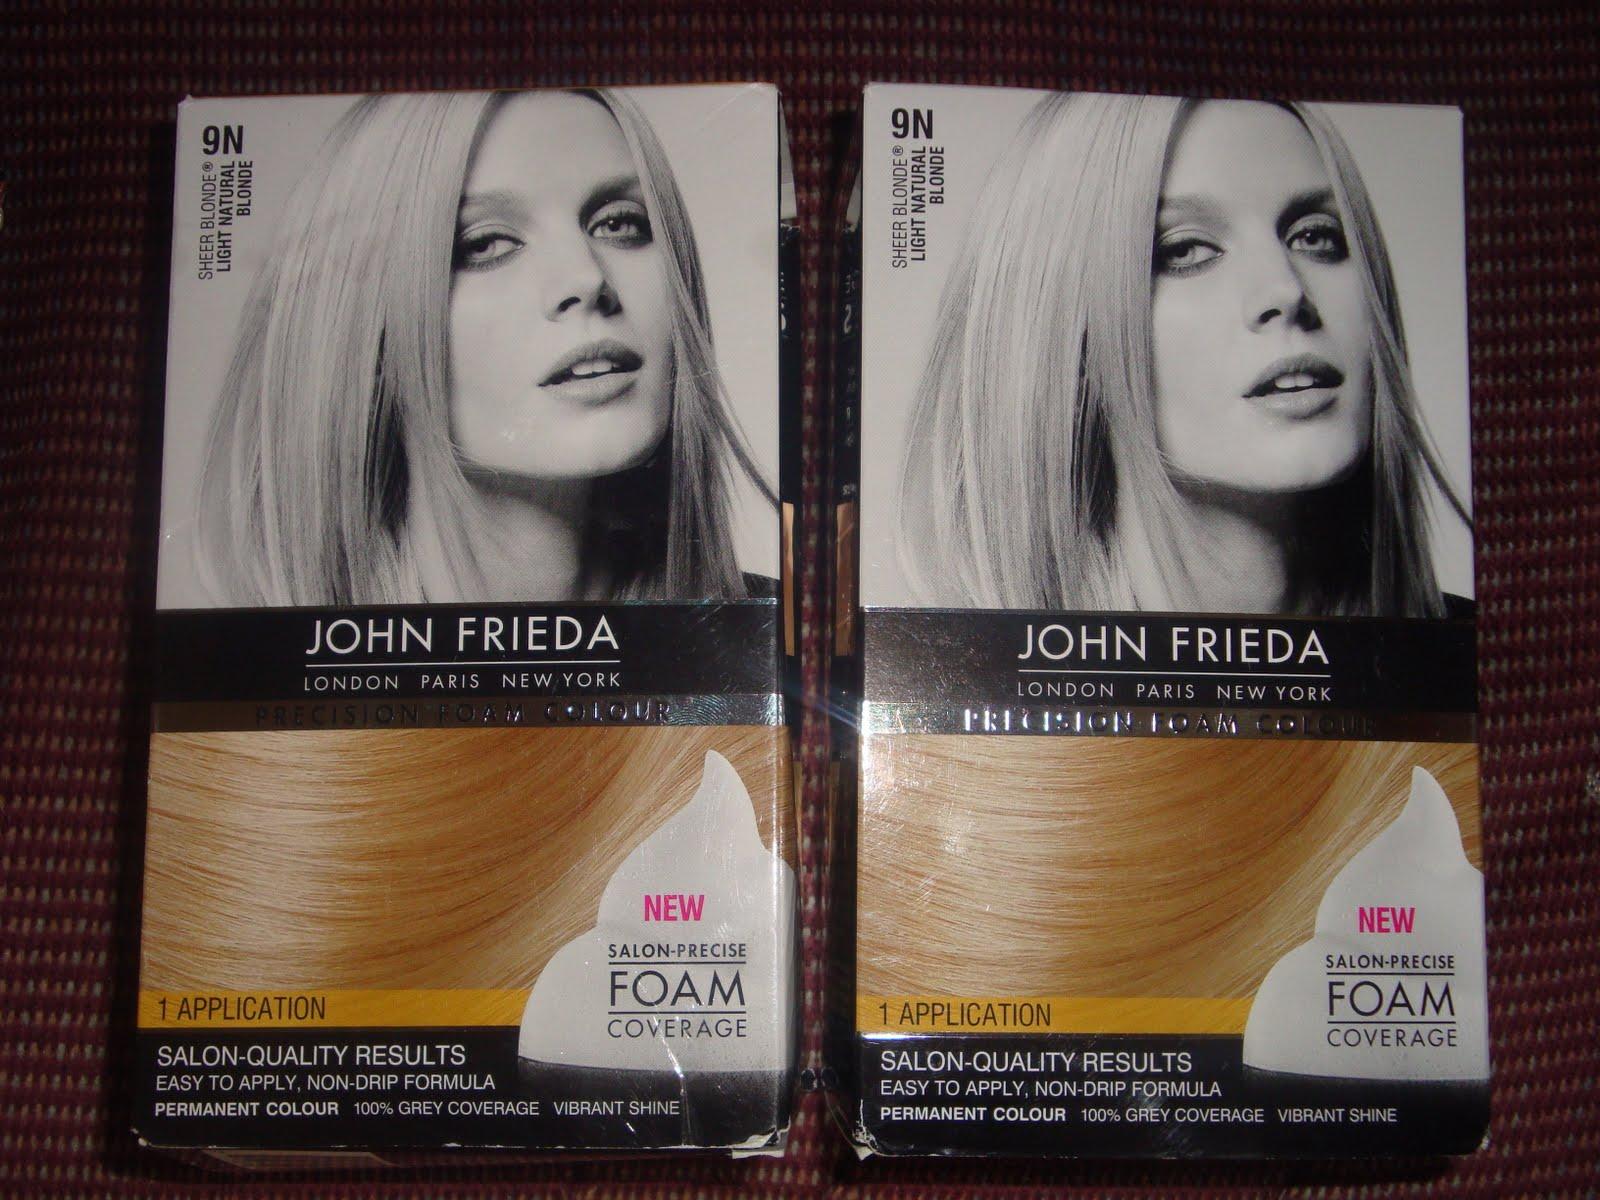 M Loves Deals!: Target $20: 4 kids gifts, 4 hair dye, 4 ...